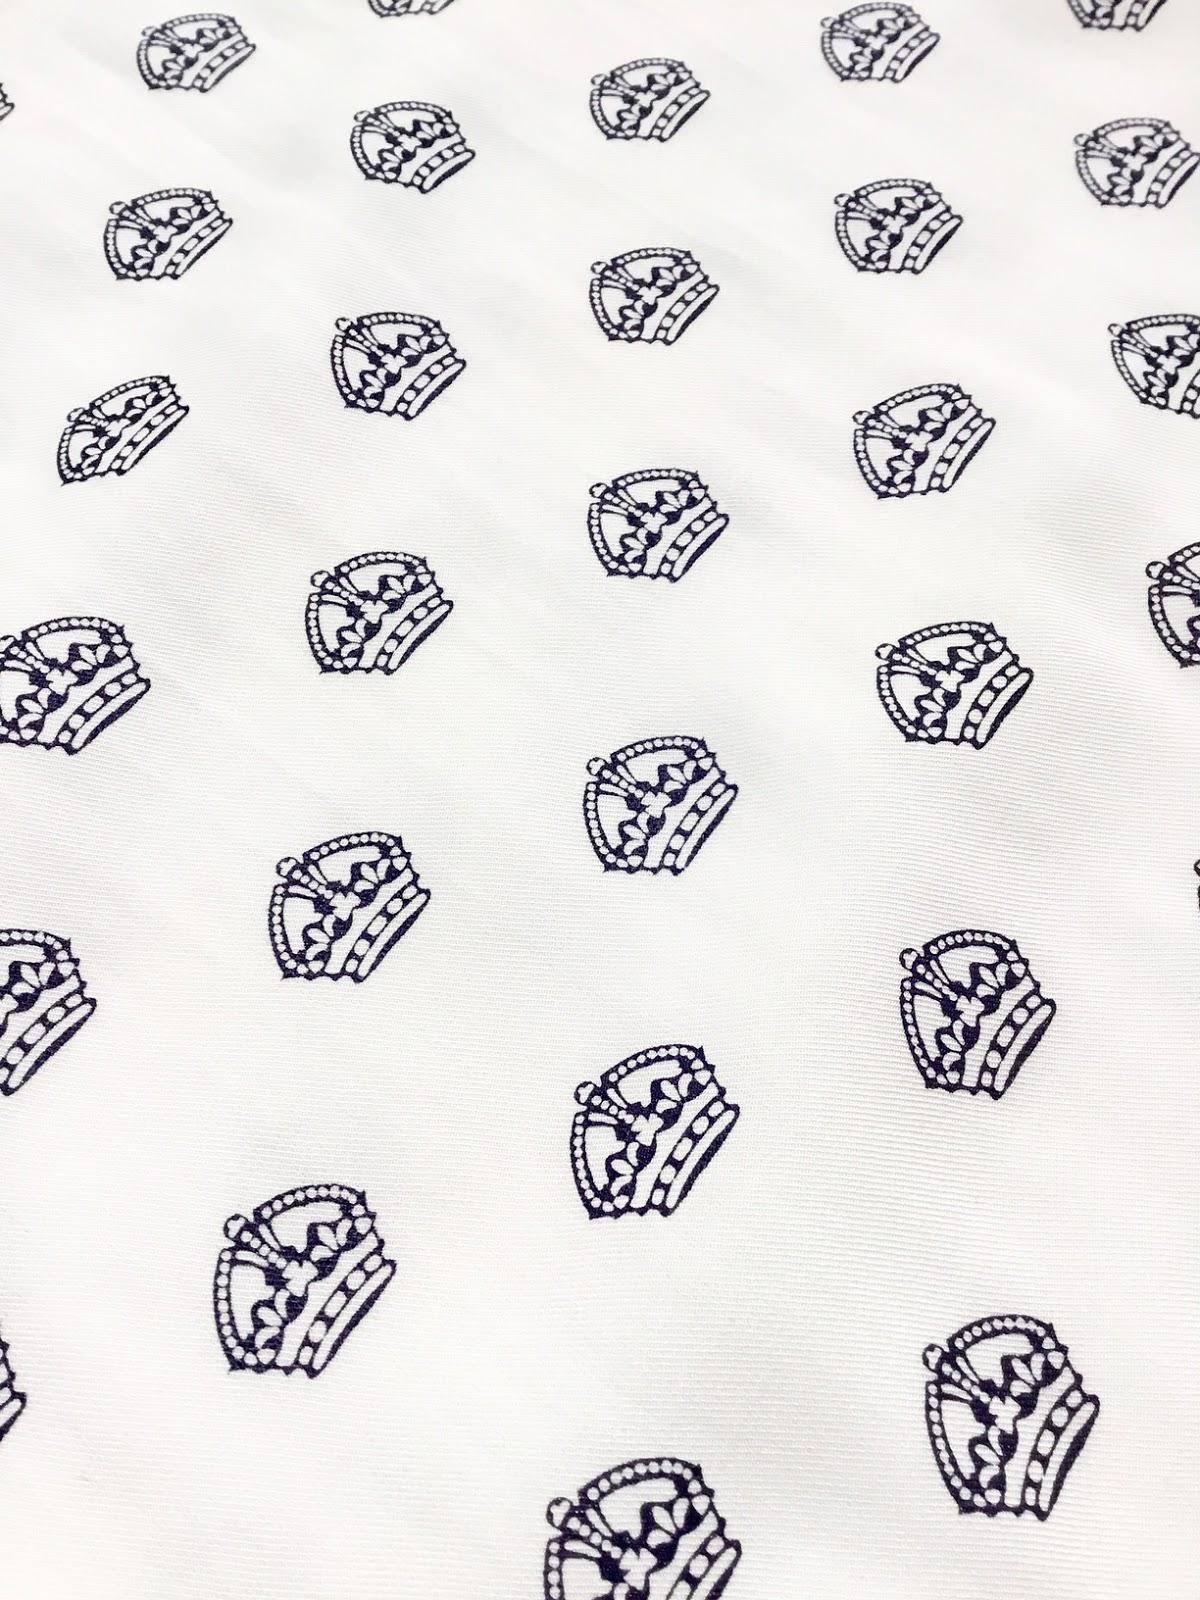 SKETCH mintdesigns【スケッチ ミントデザインズ】CROWN DRESS◆eighty88eight 綾川・新居浜